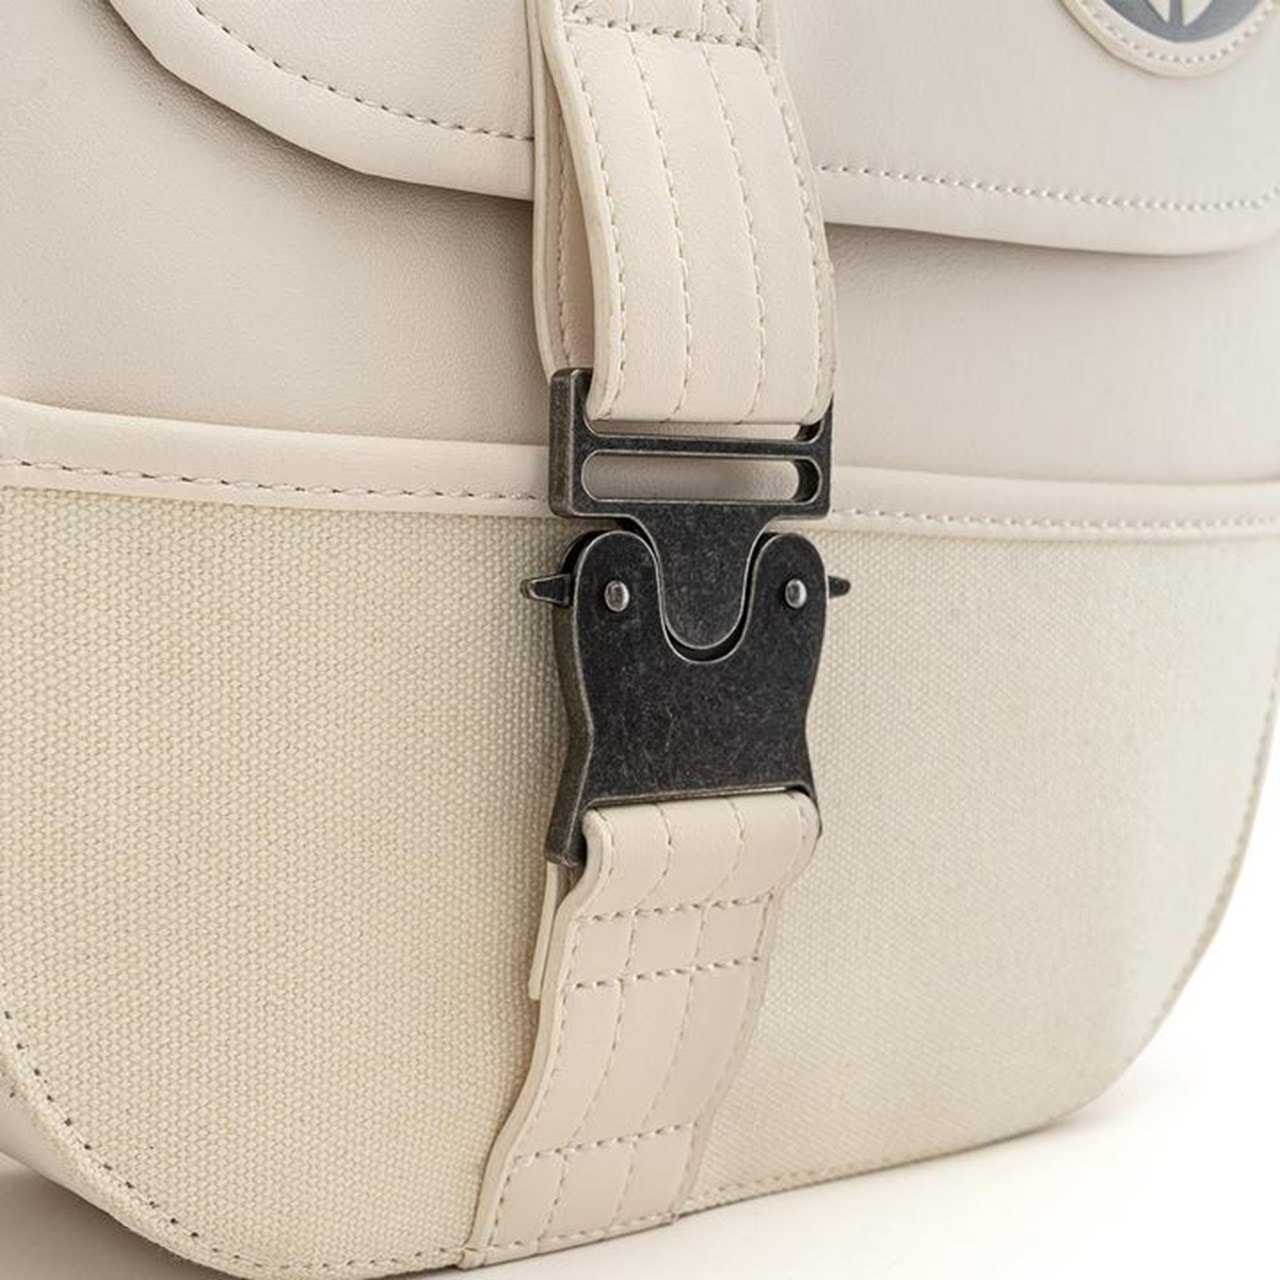 Loungefly X Star Wars Rey Cosplay Sling Bag - 4